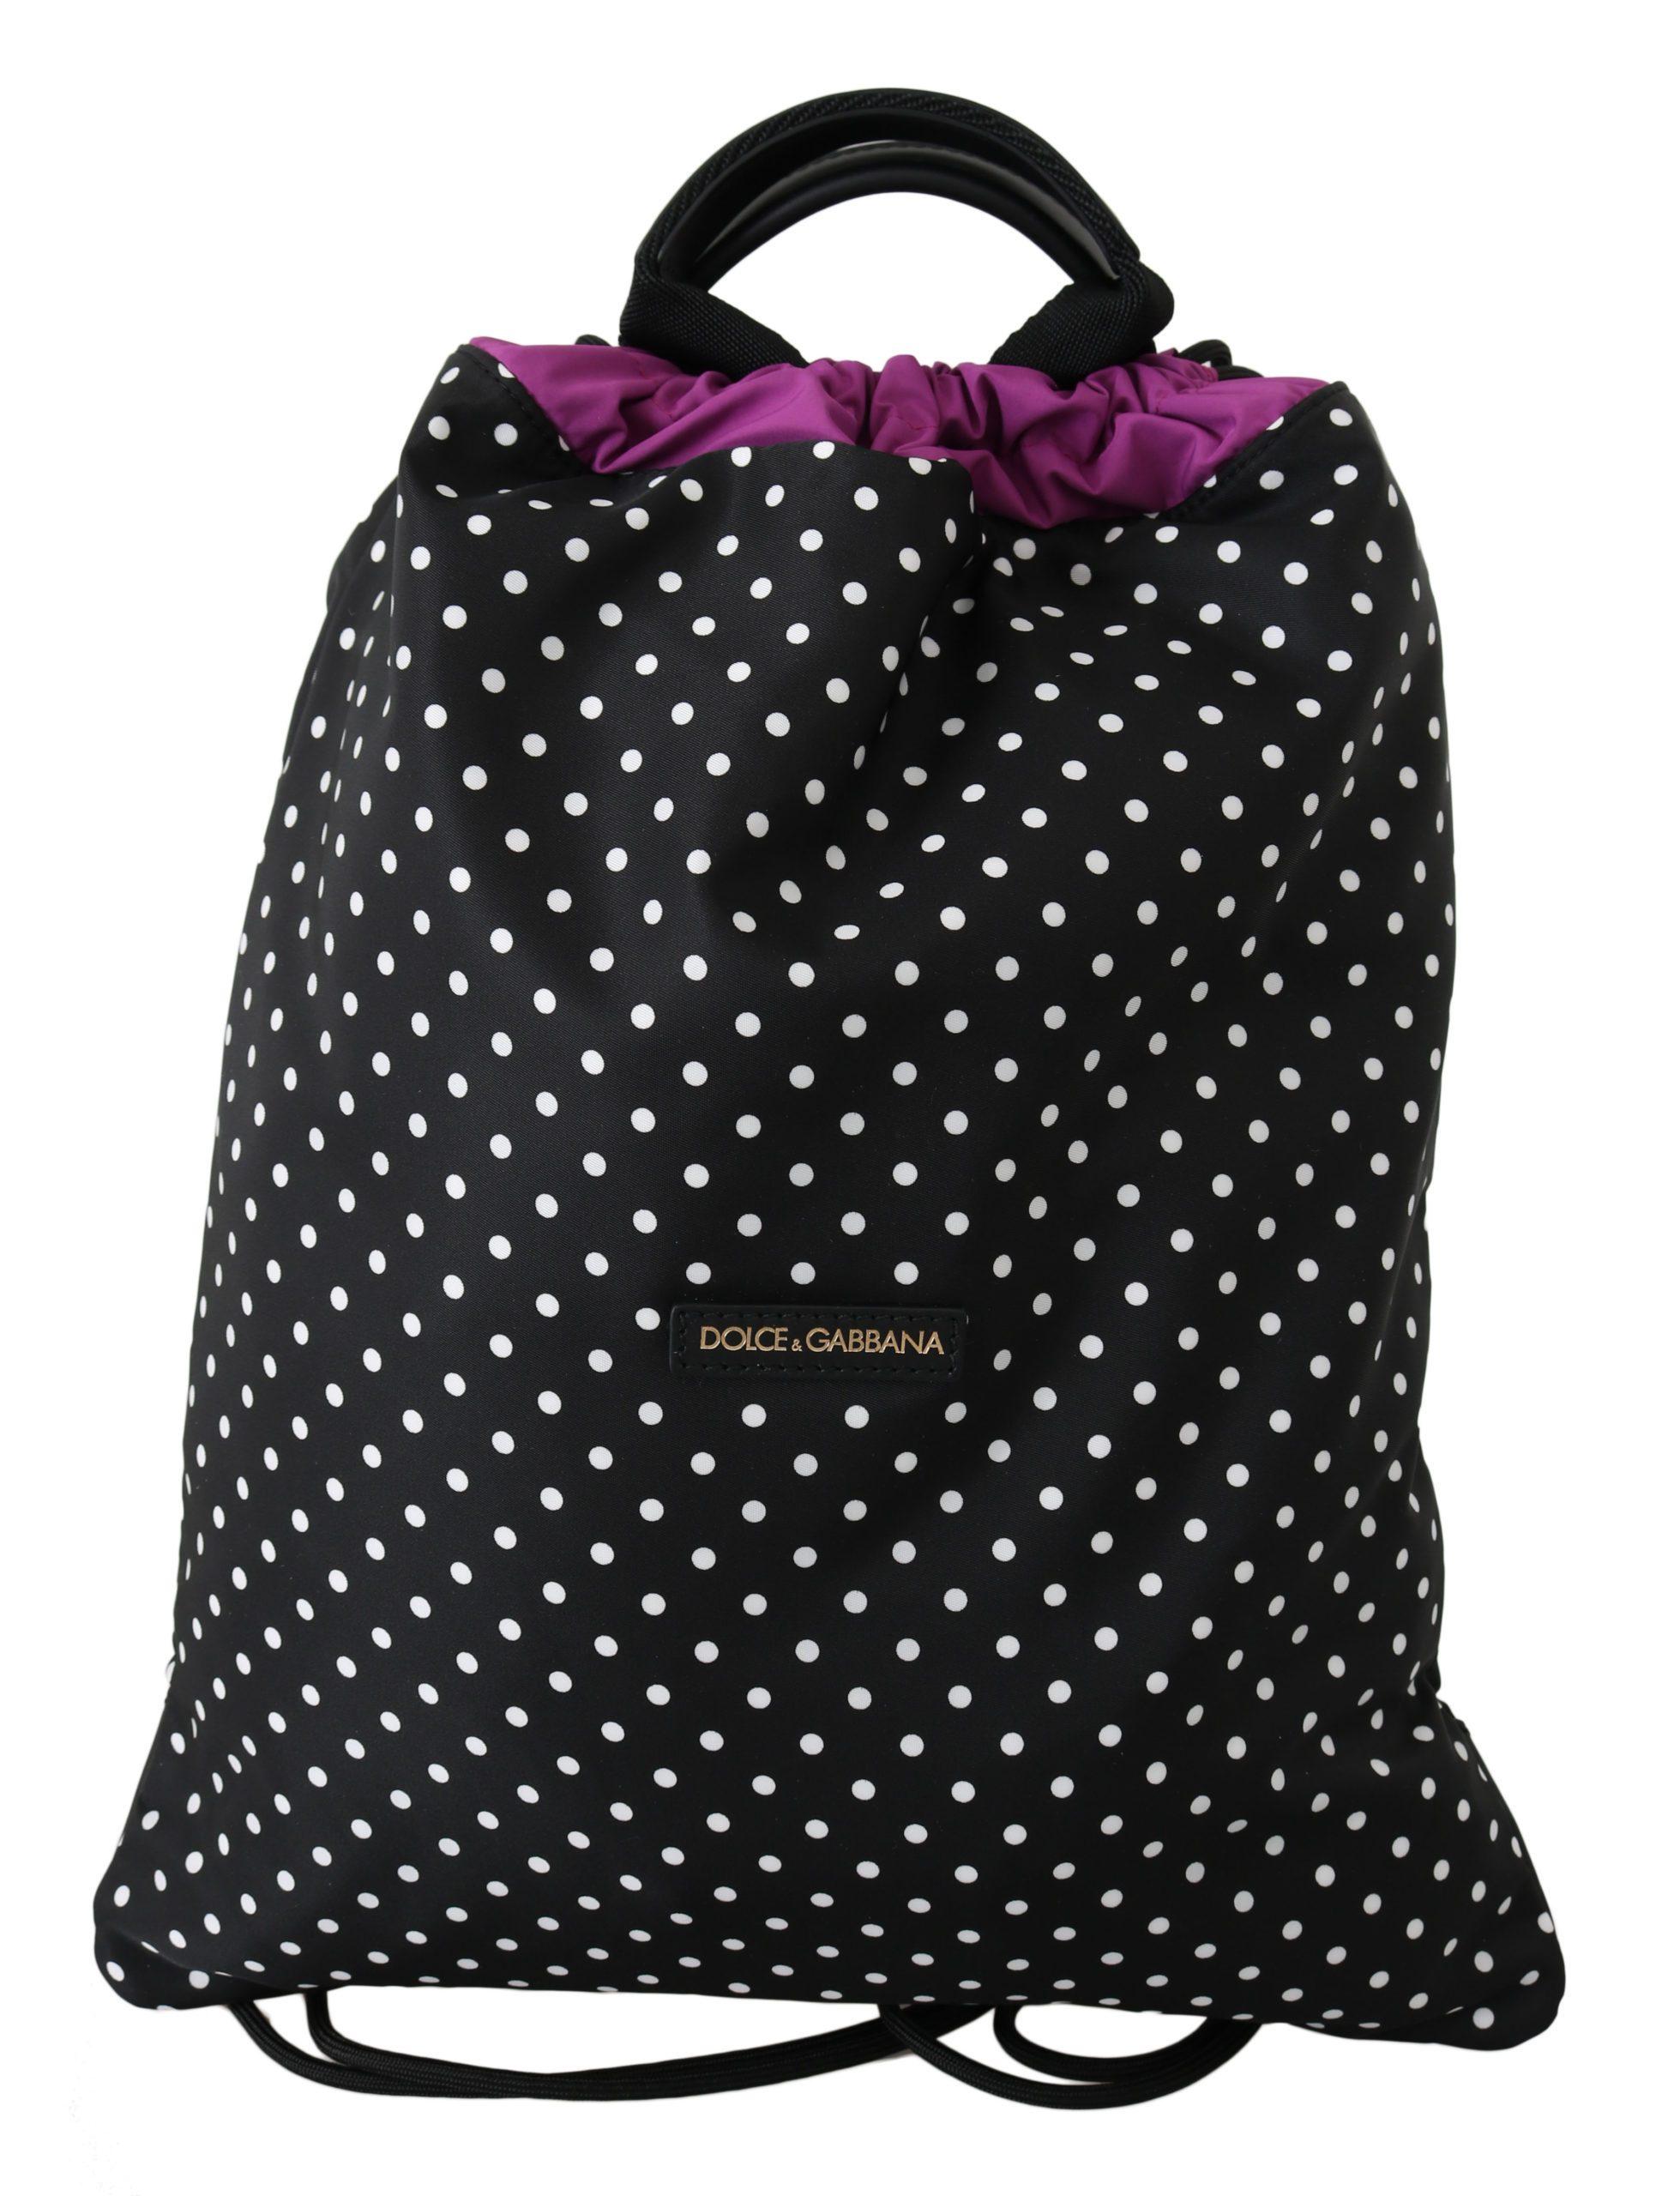 Dolce & Gabbana Women's Dotted Drawstring Nap Sack Black VA8638